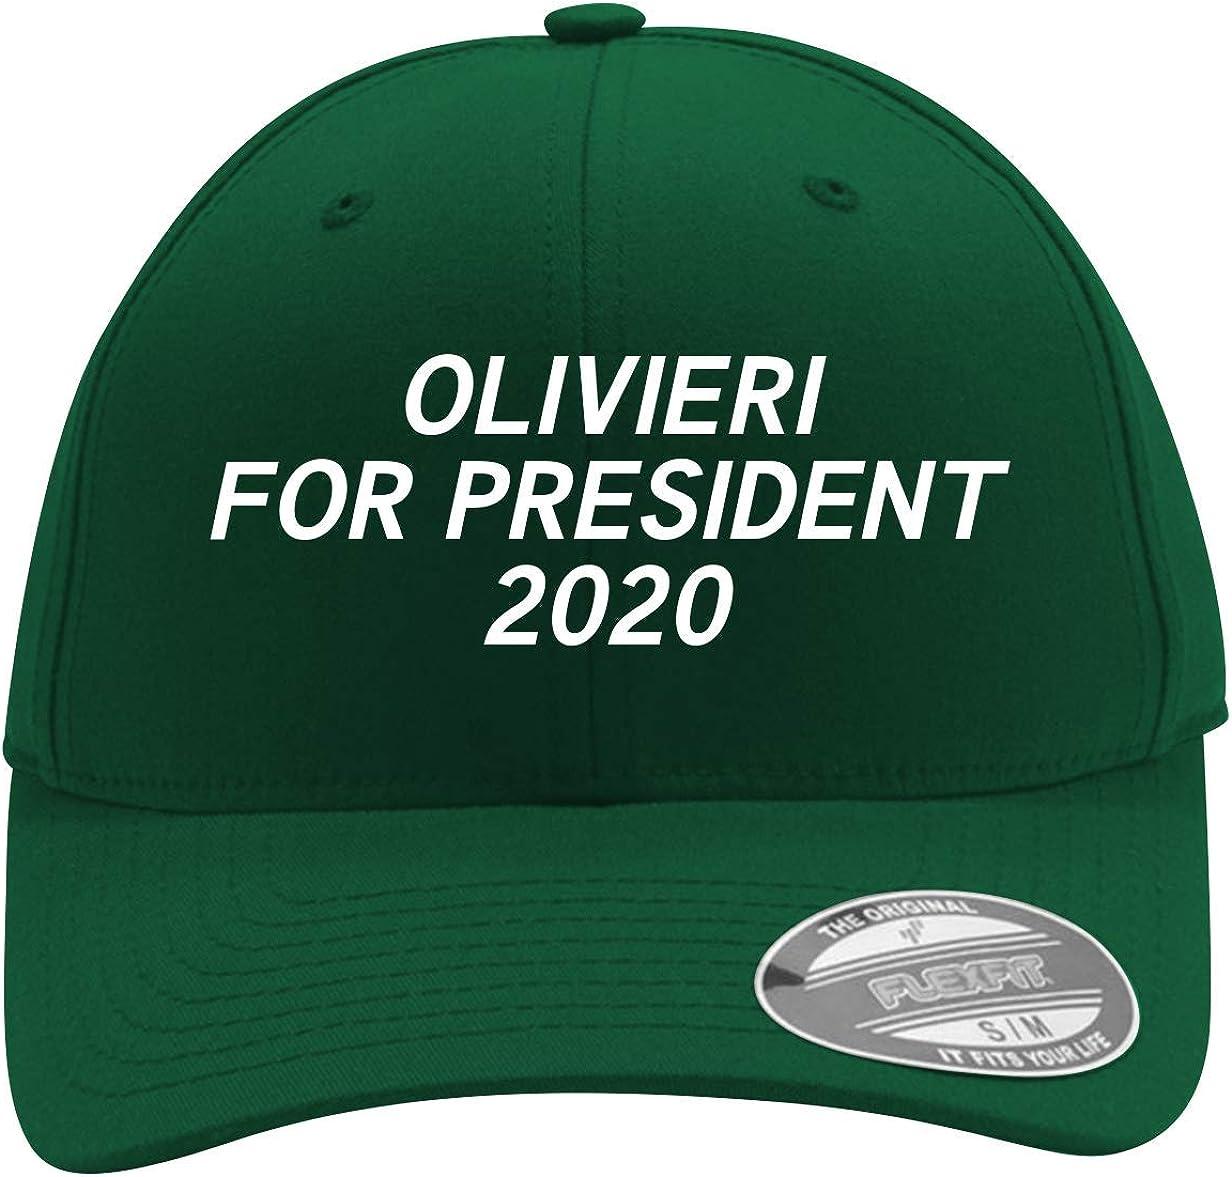 Olivieri für President 2020 - Men'S Flexfit Baseball Cap Hat